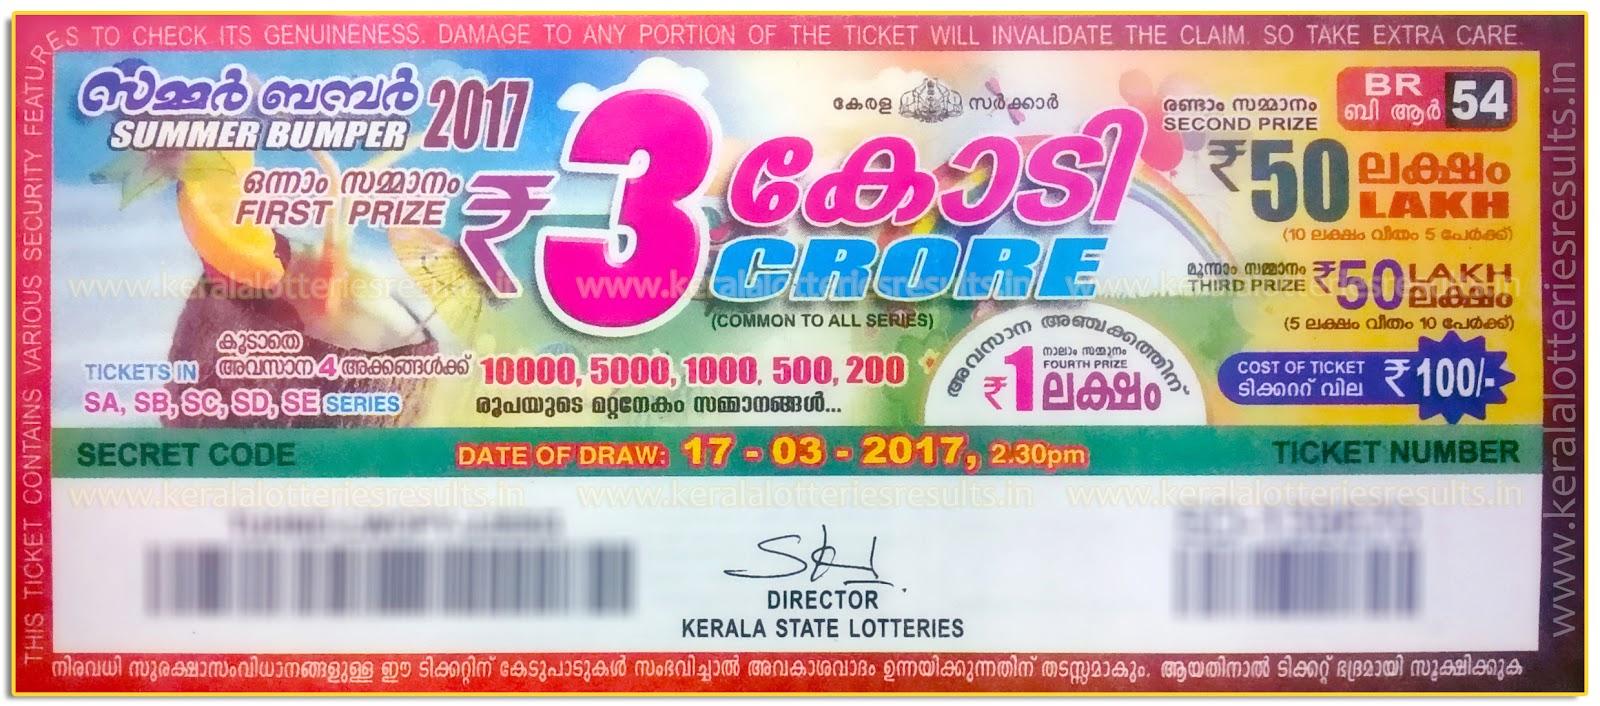 kerala state lotteries കേരള ലോട്ടറി റിസൾട്ട് live kerala lottery results official is karunya plus  lottery kn 226 on 16-8-2018, kerala lottery result  kerala state lotteries.